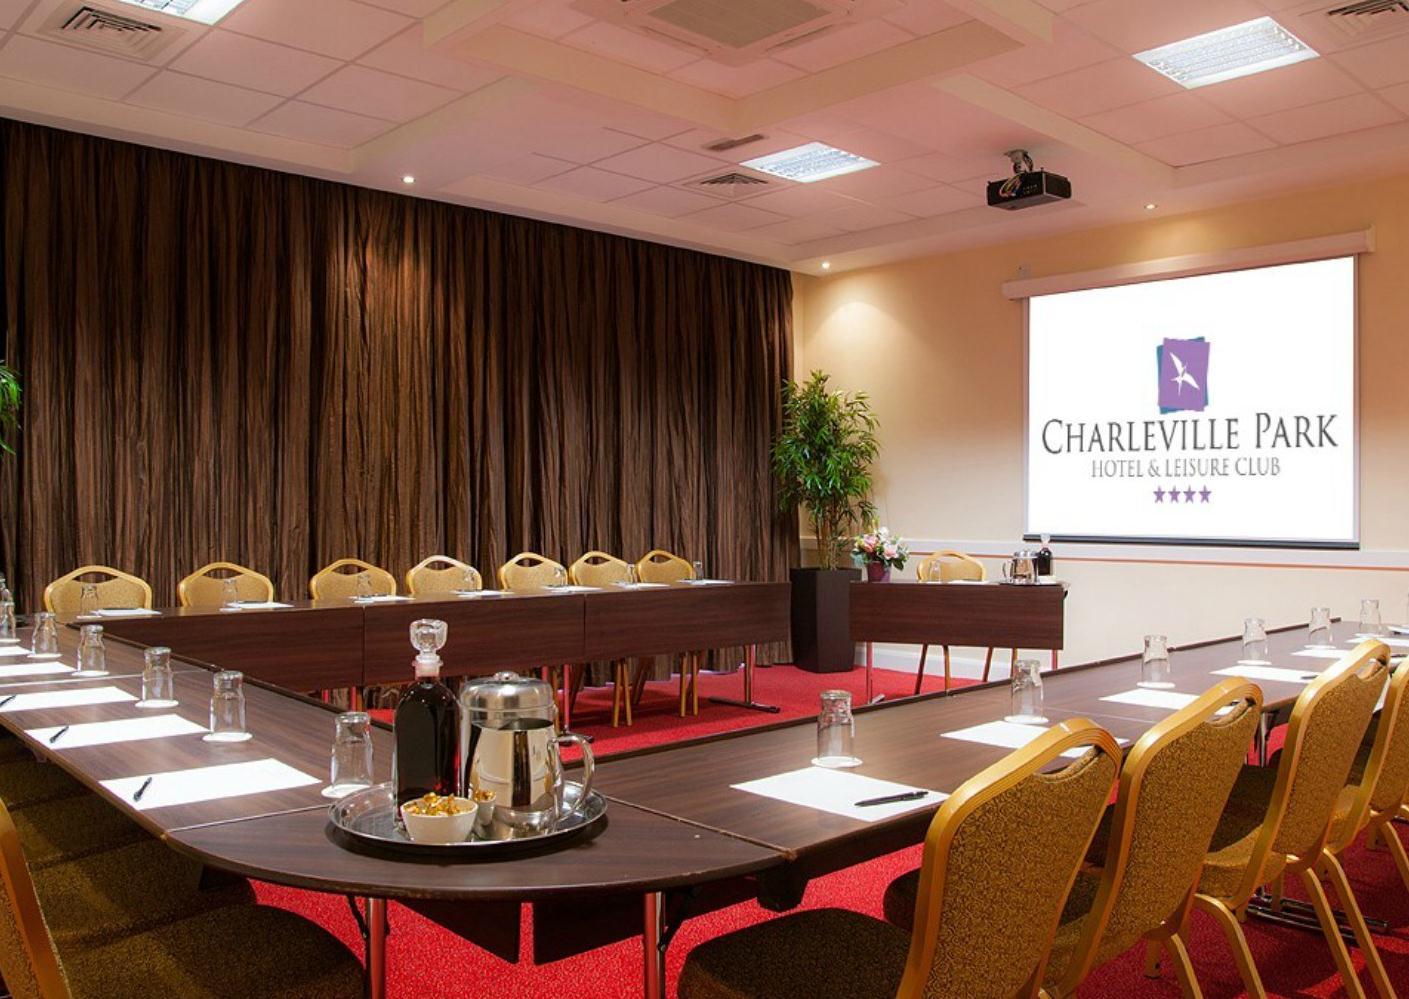 charleville park hotel leisure club